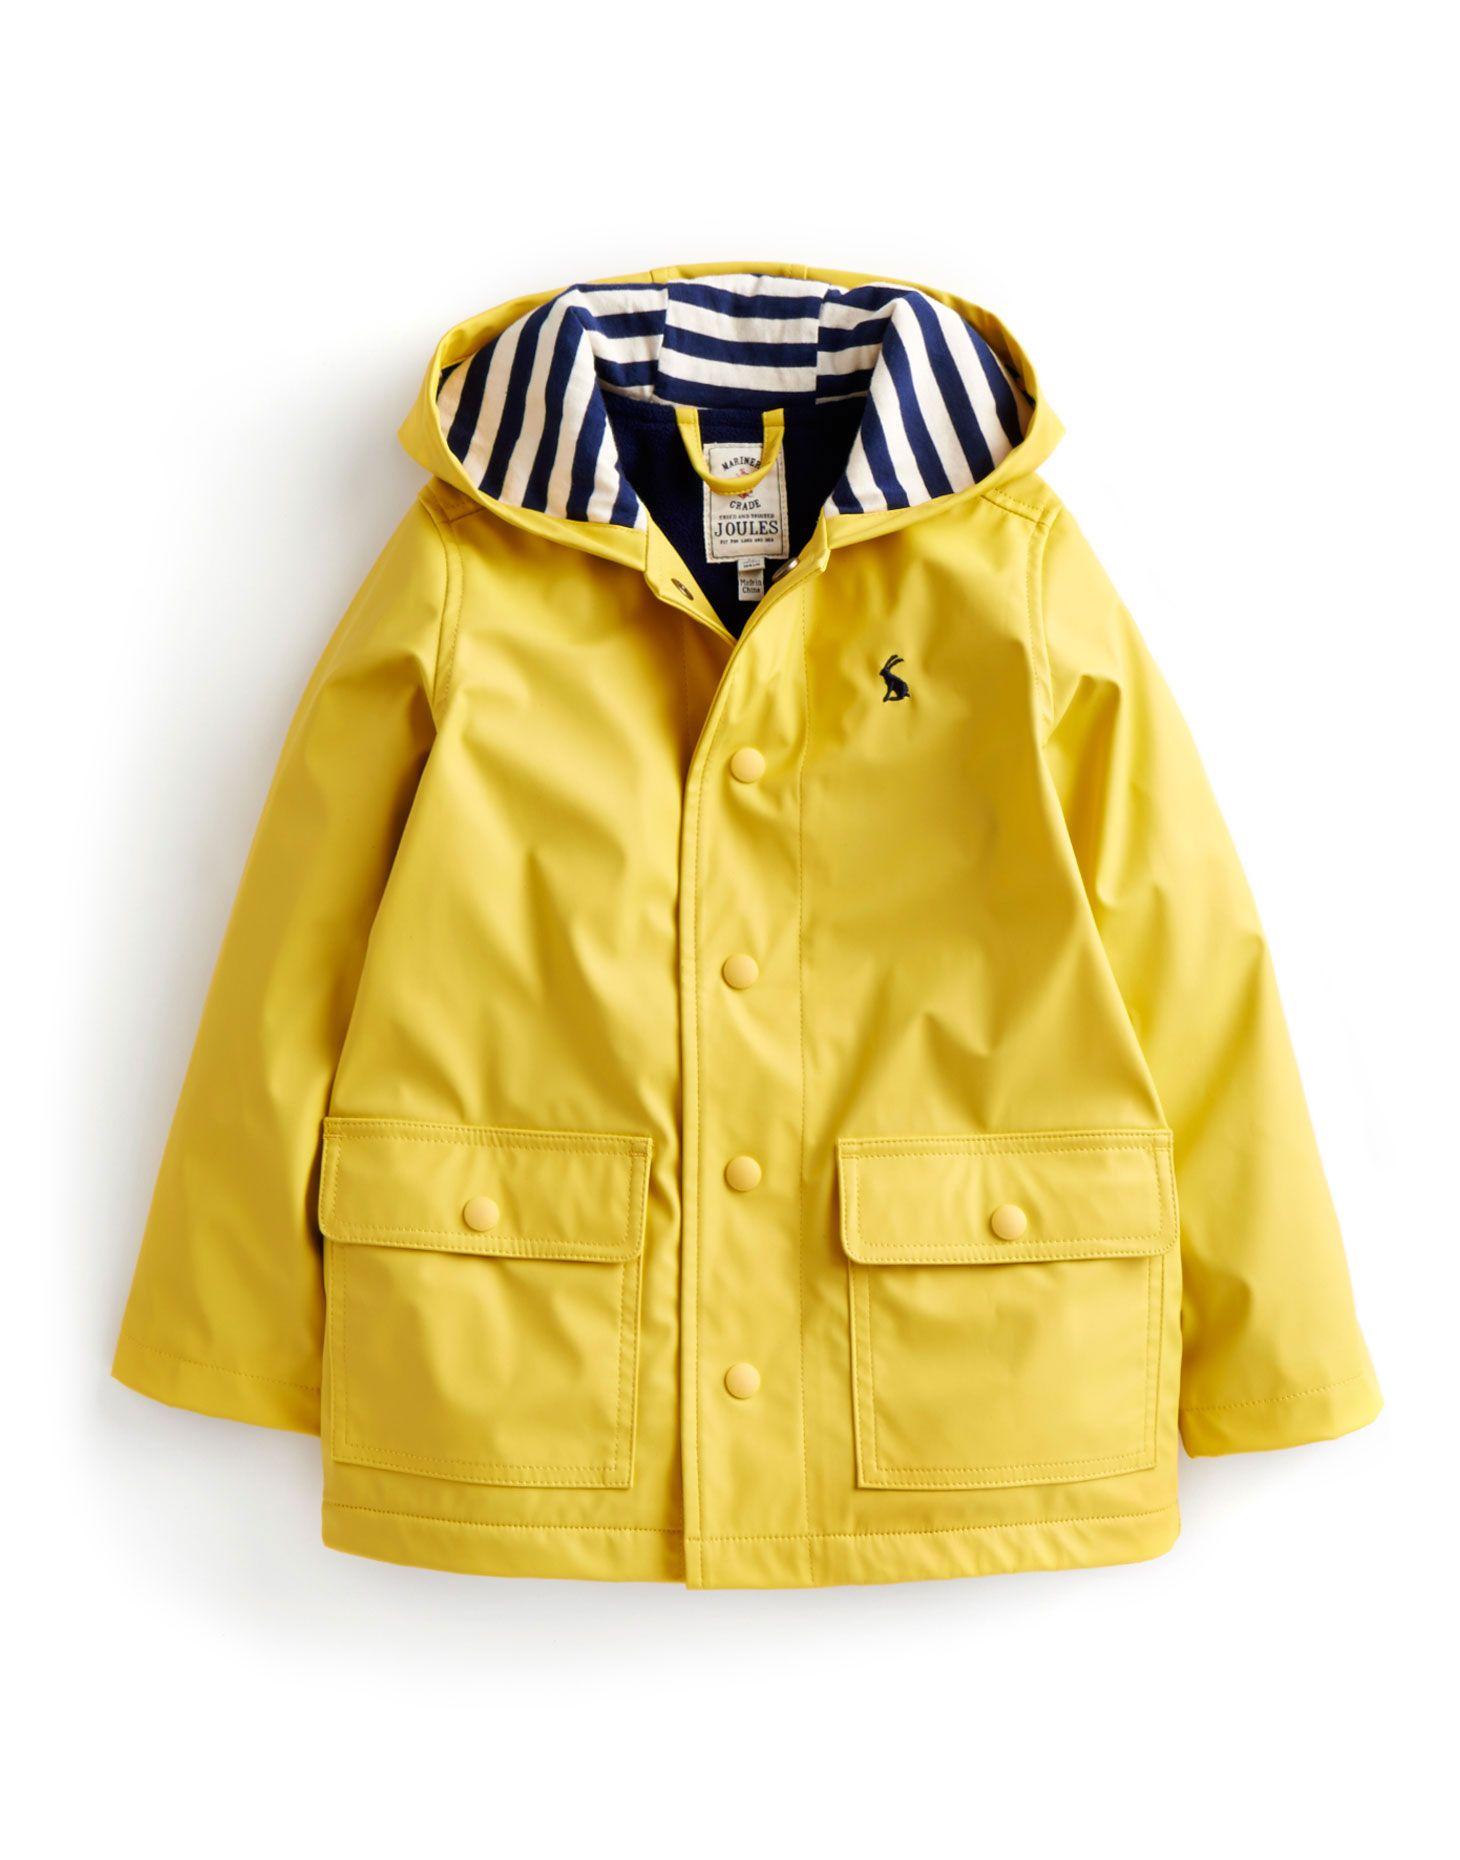 b9ba13951241 Mimosa Jnr jetty Boys Nautical Jacket